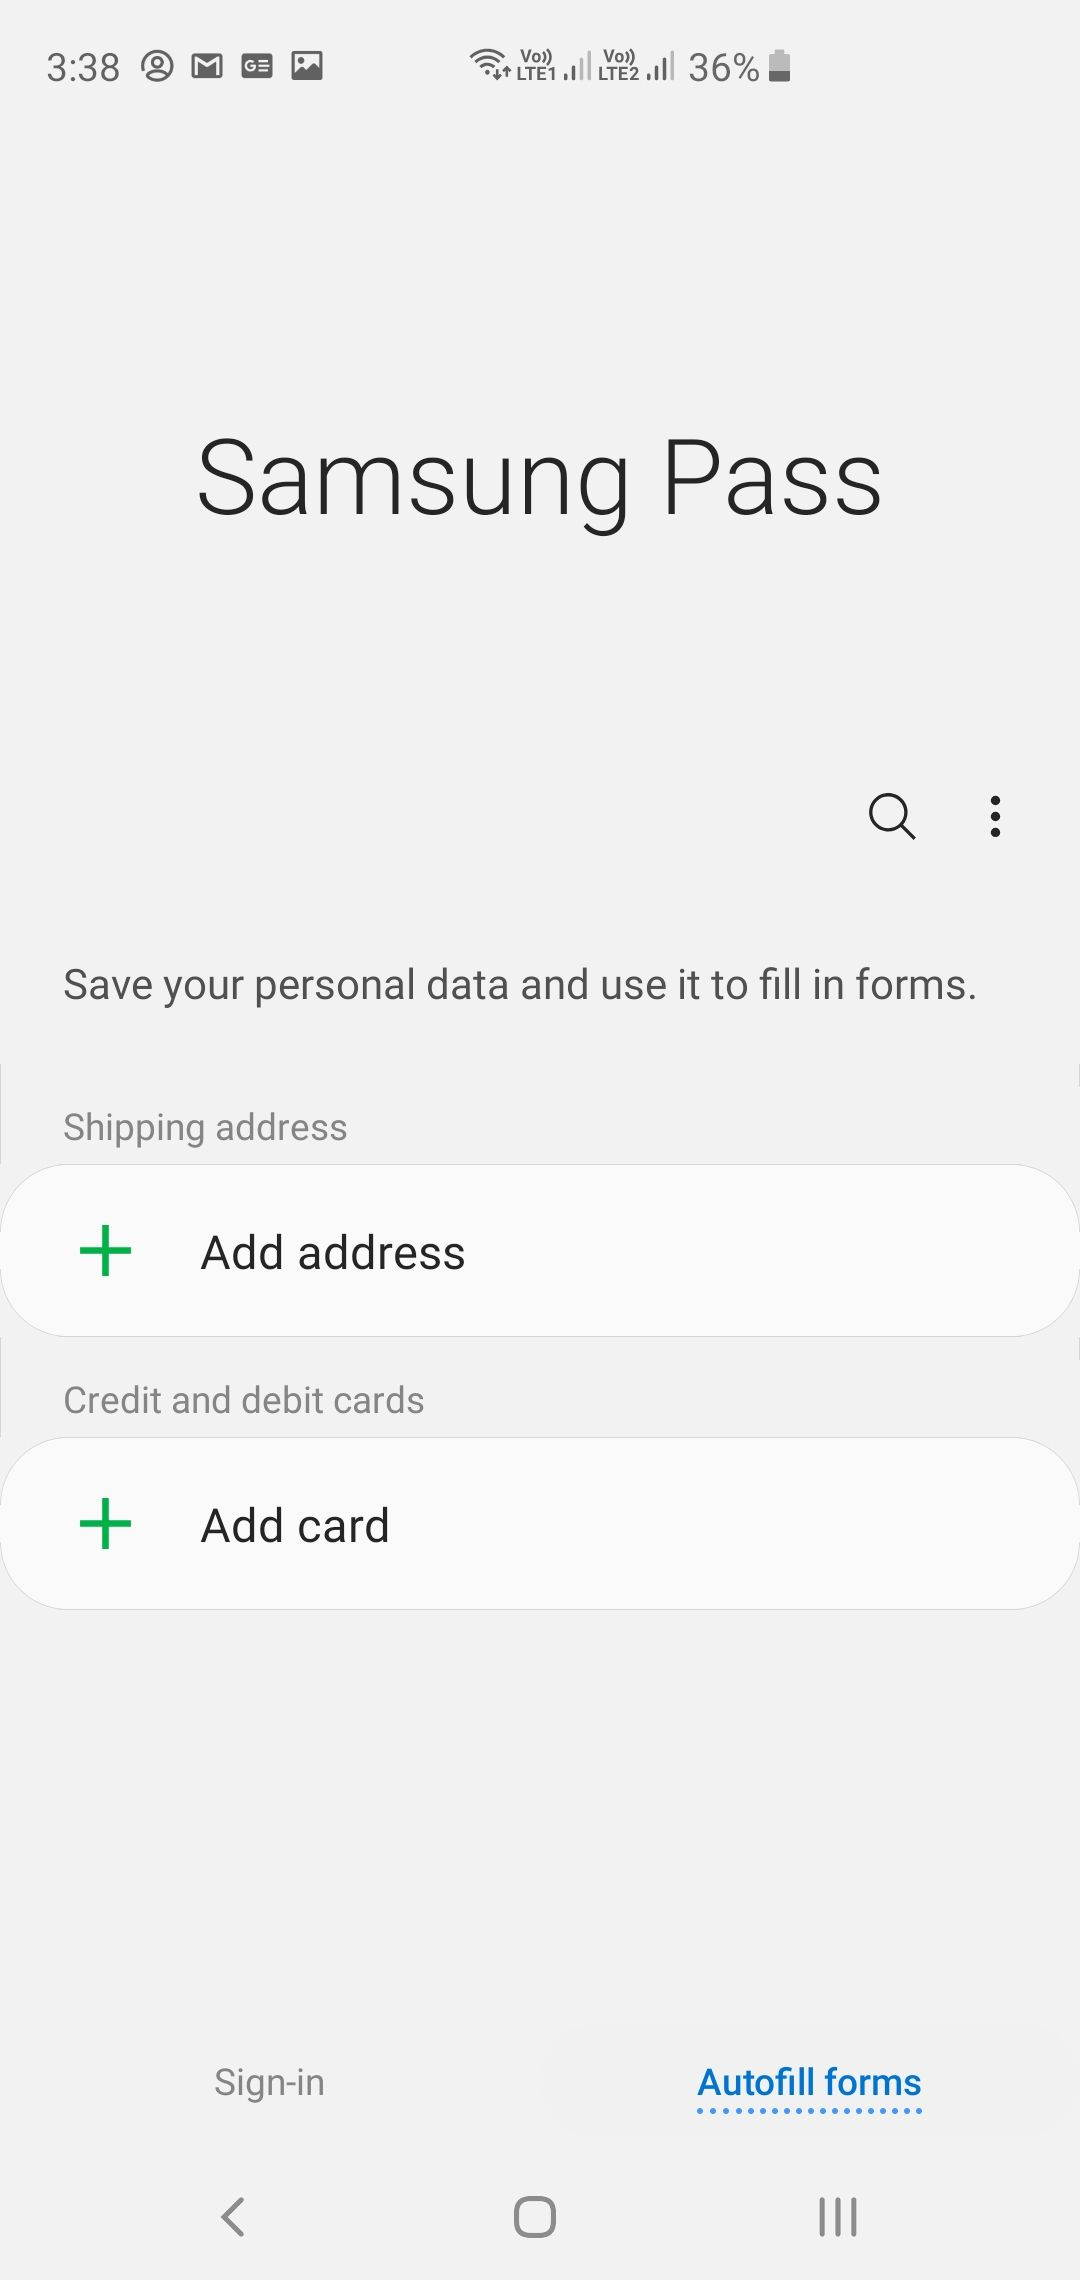 Samsung Galaxy S10+ Samsung Pass App Autofill Forms